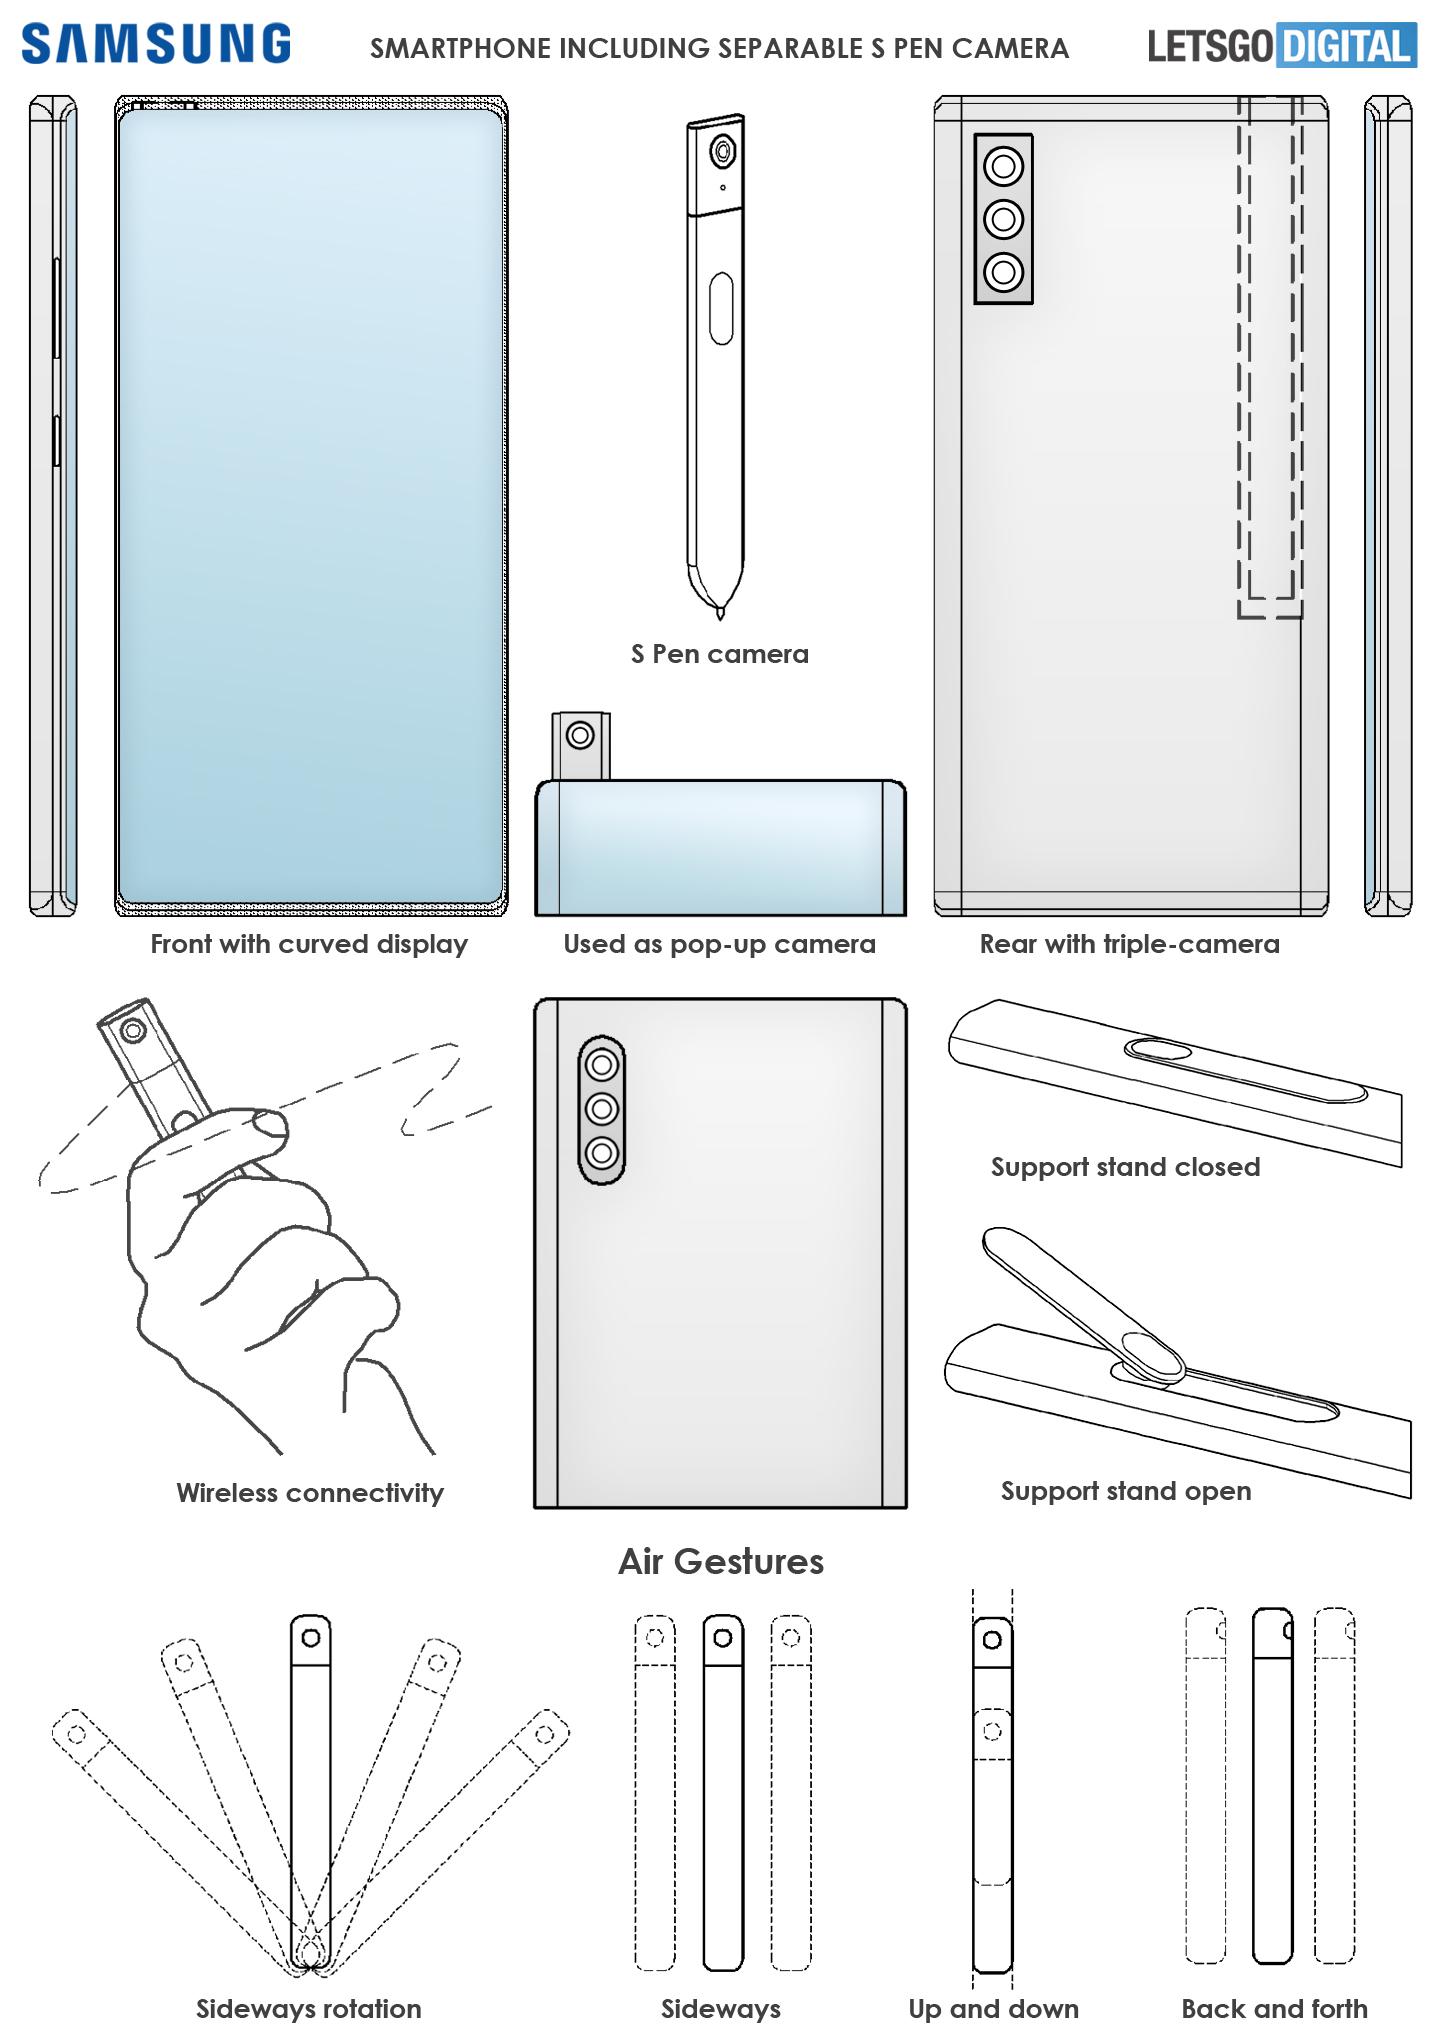 Fotocamera Samsung Note S Pen